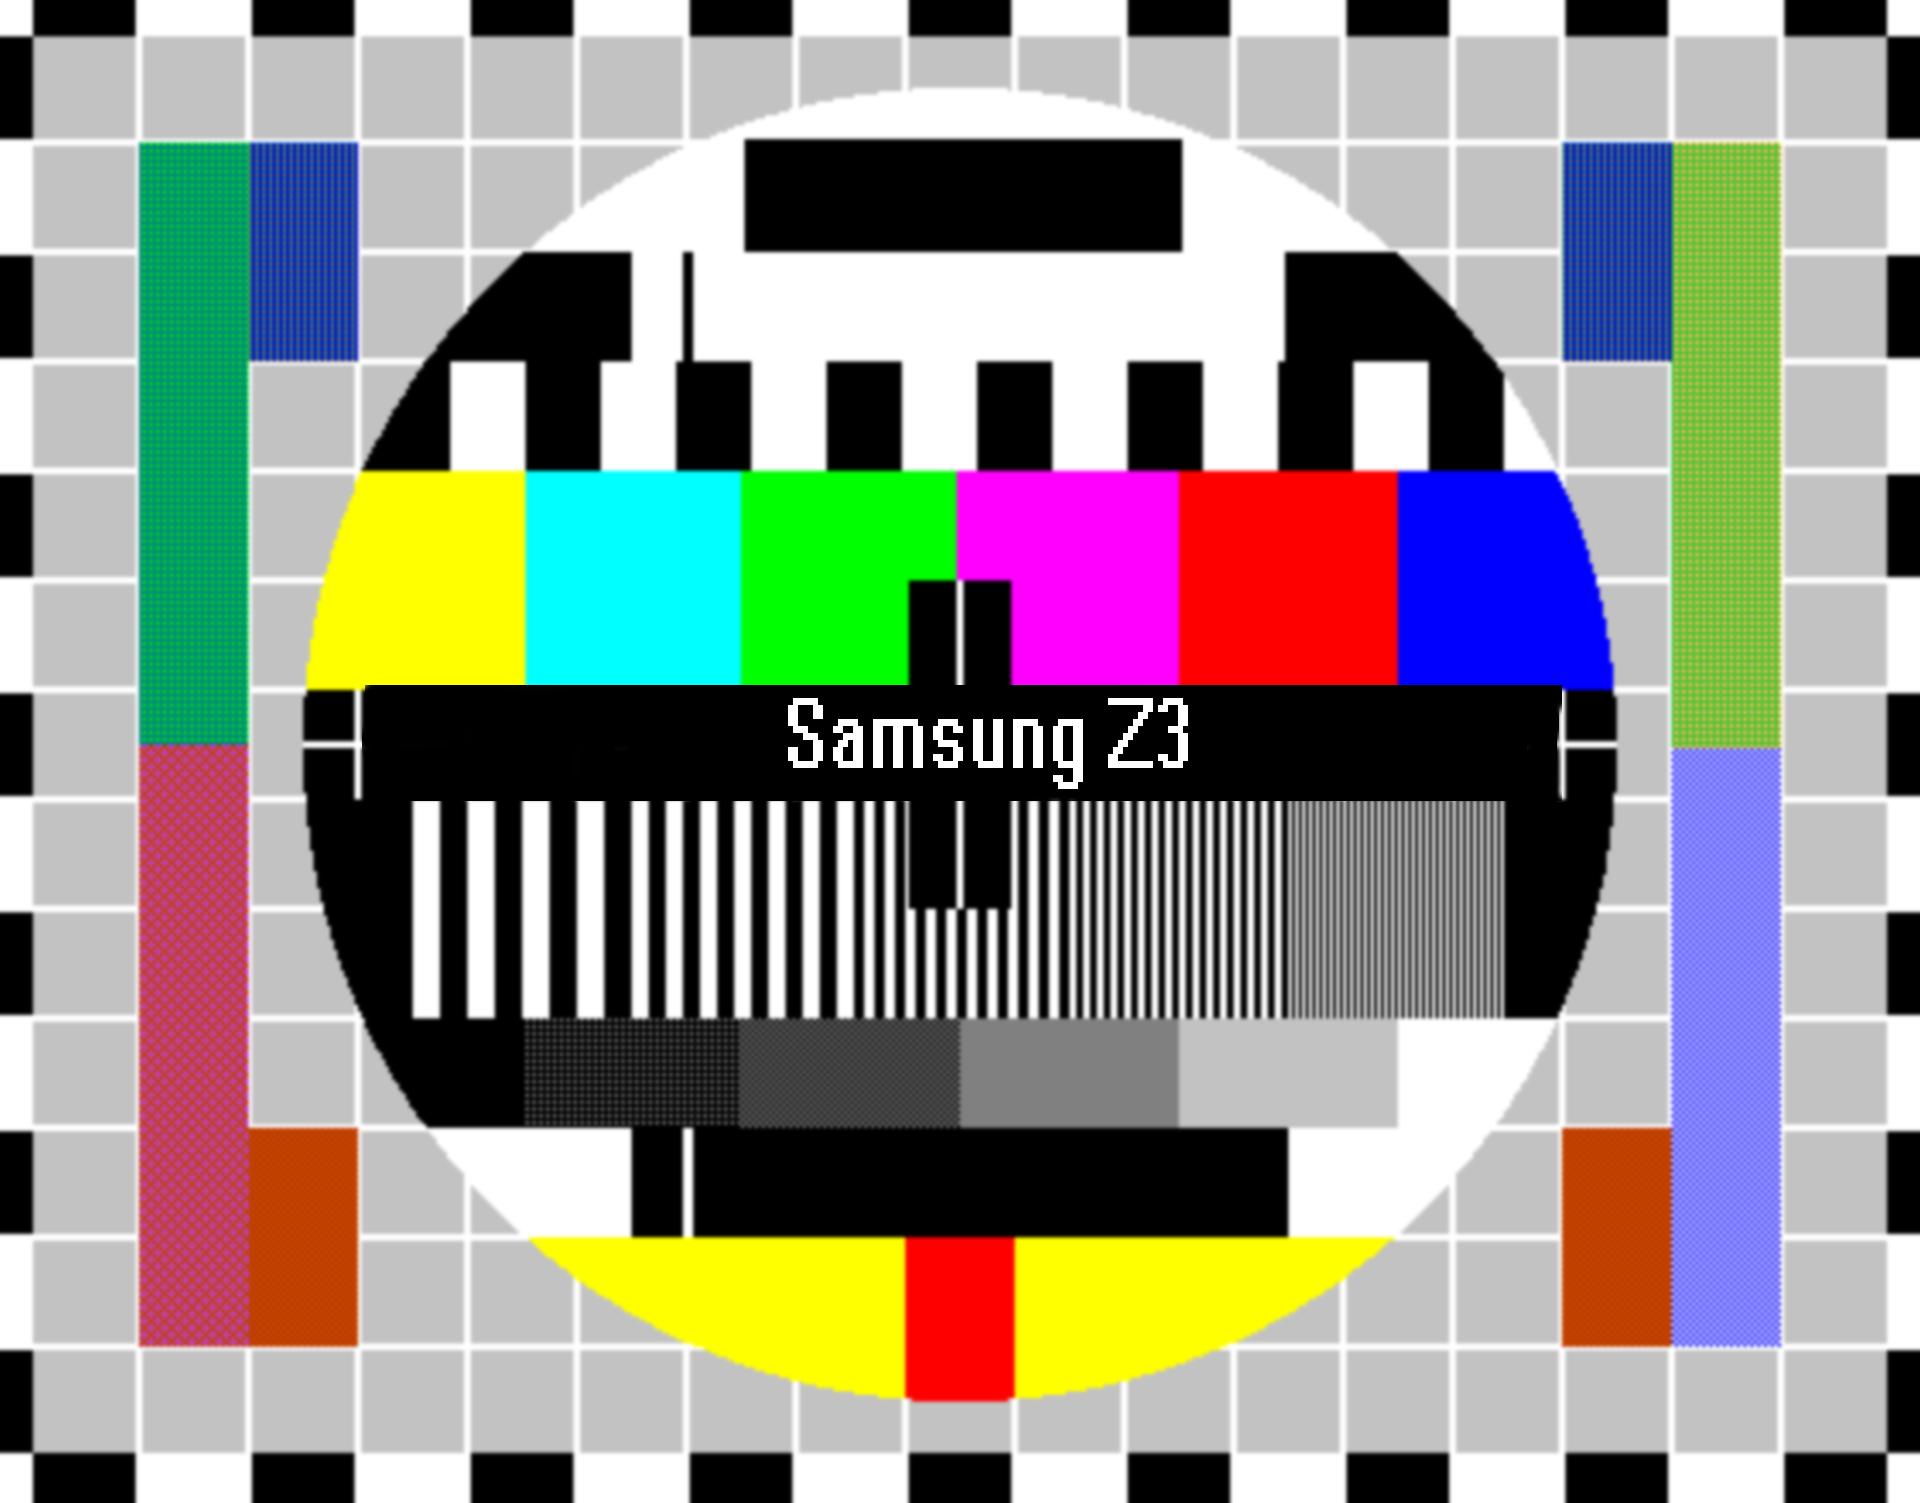 Samsung Z3 detailed screen analysis